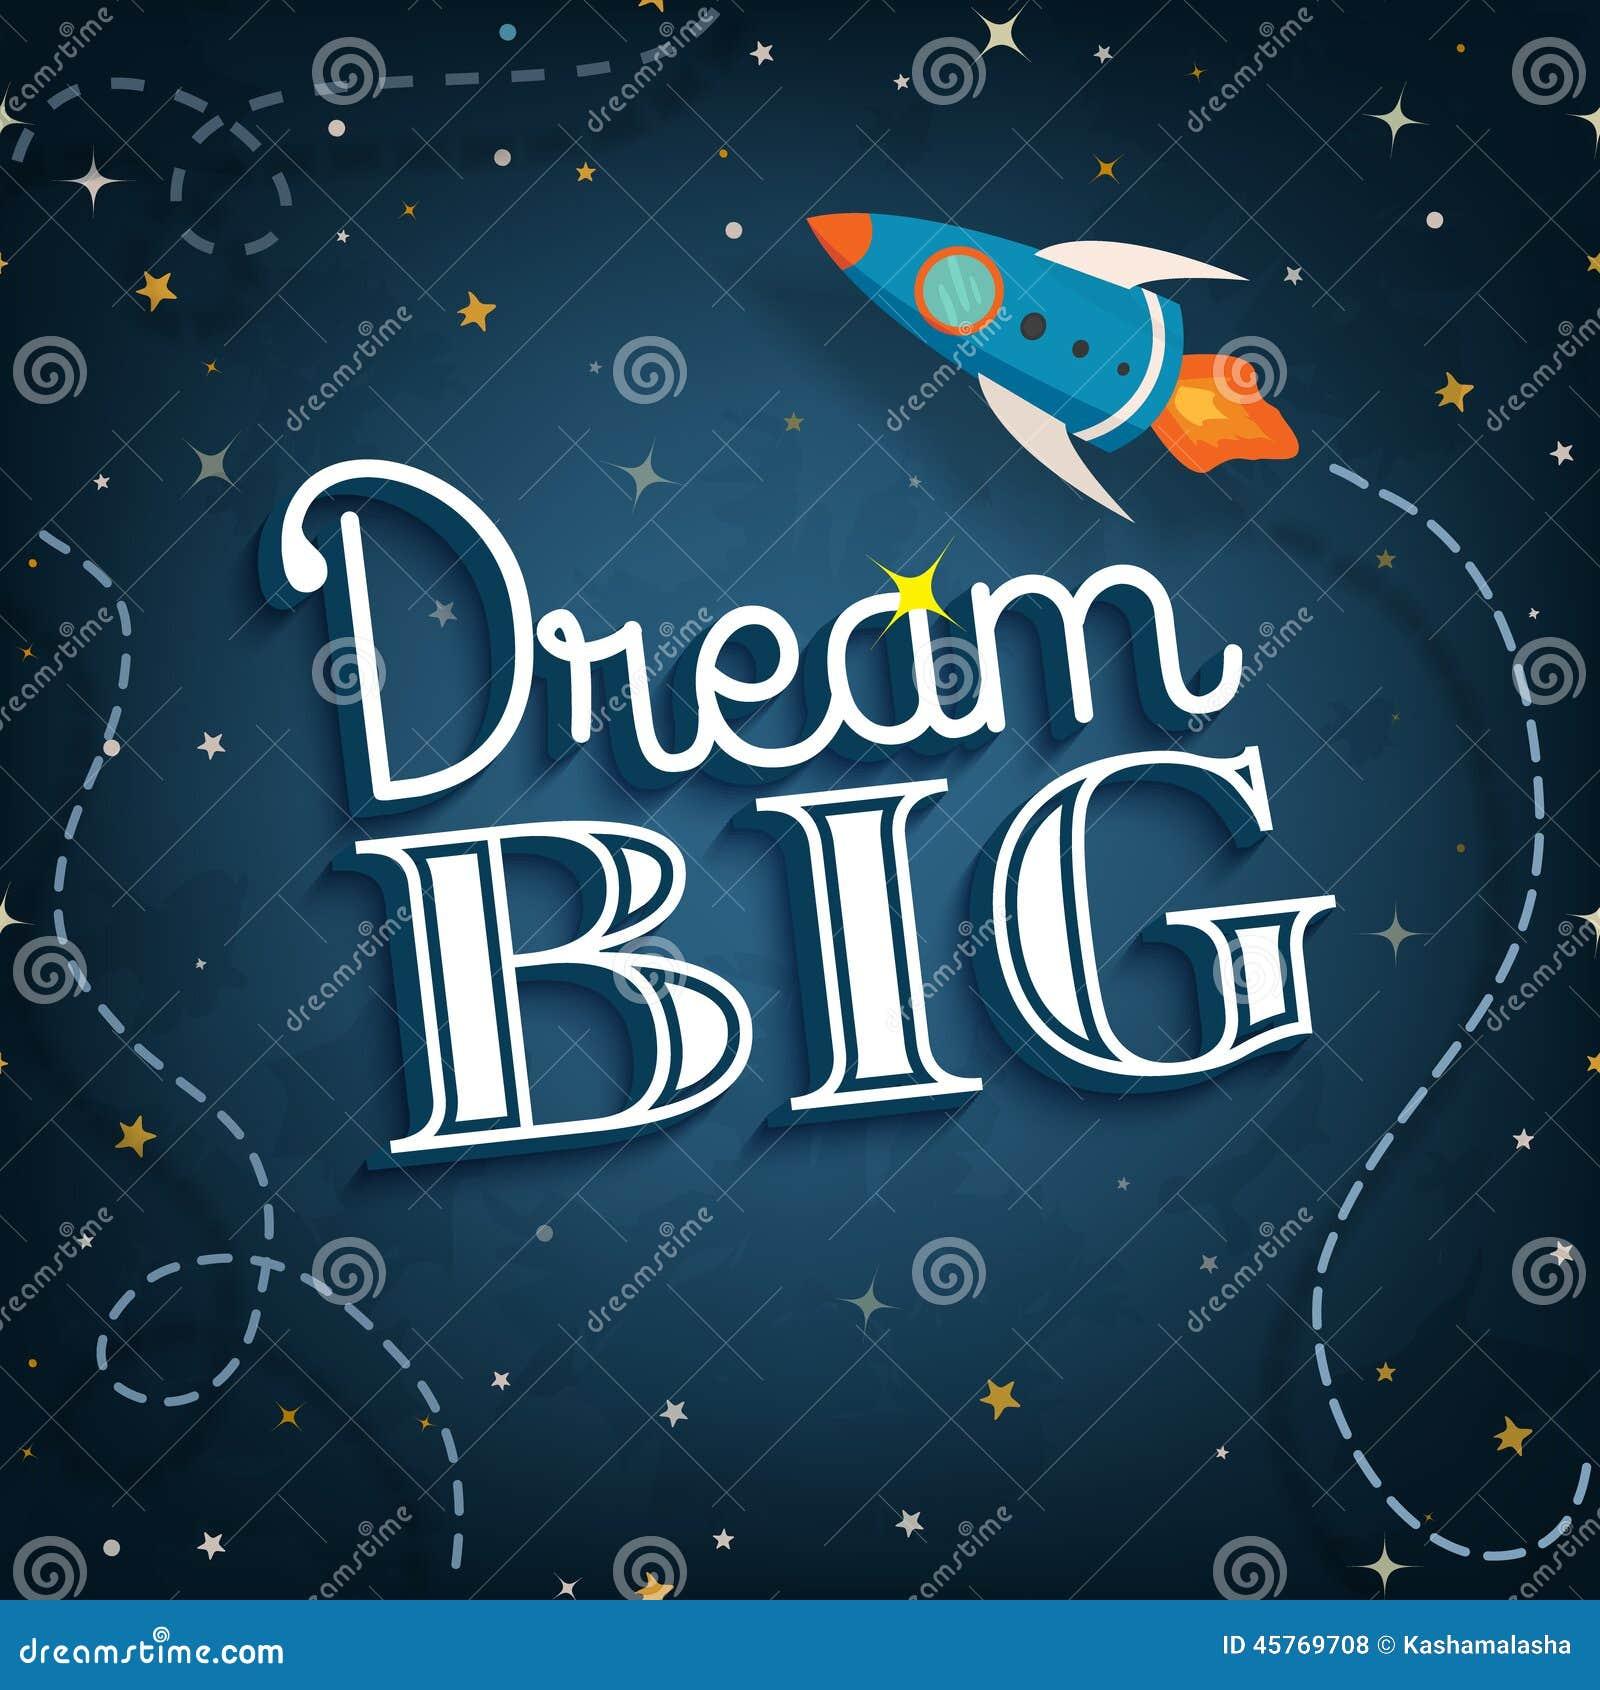 dream big inspirational typographic quote poster vector